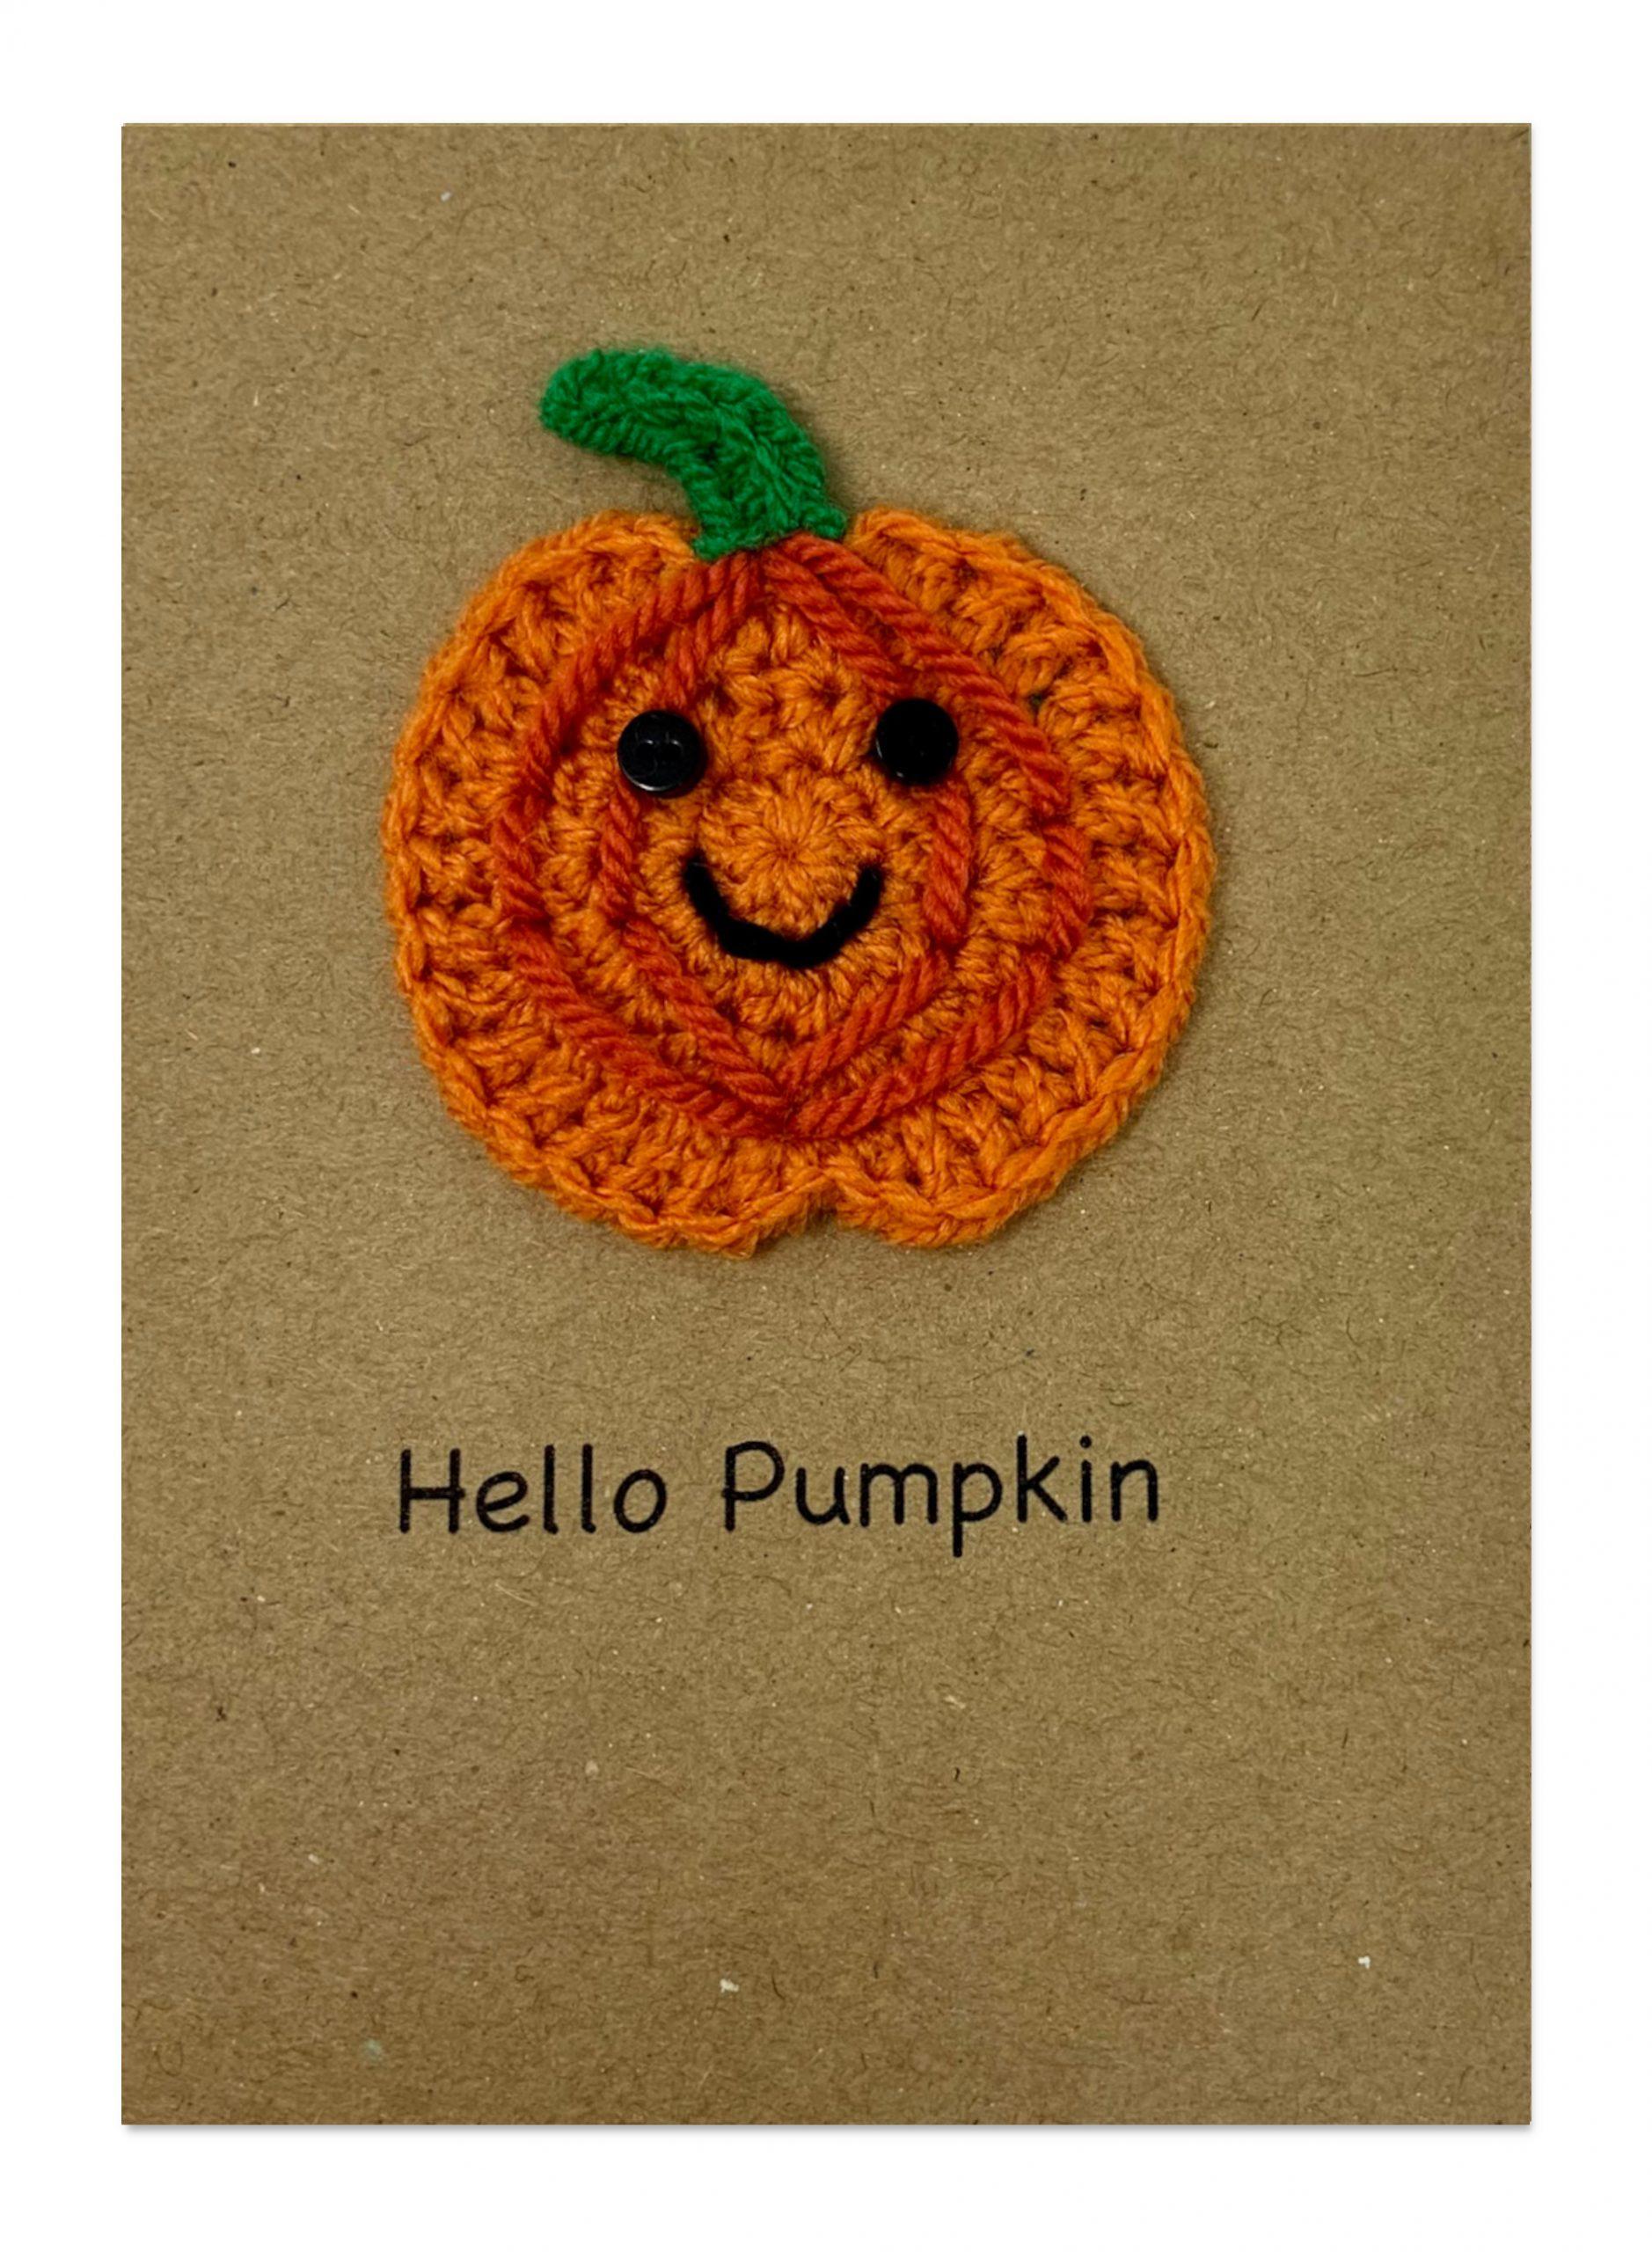 Pumpkin - edited